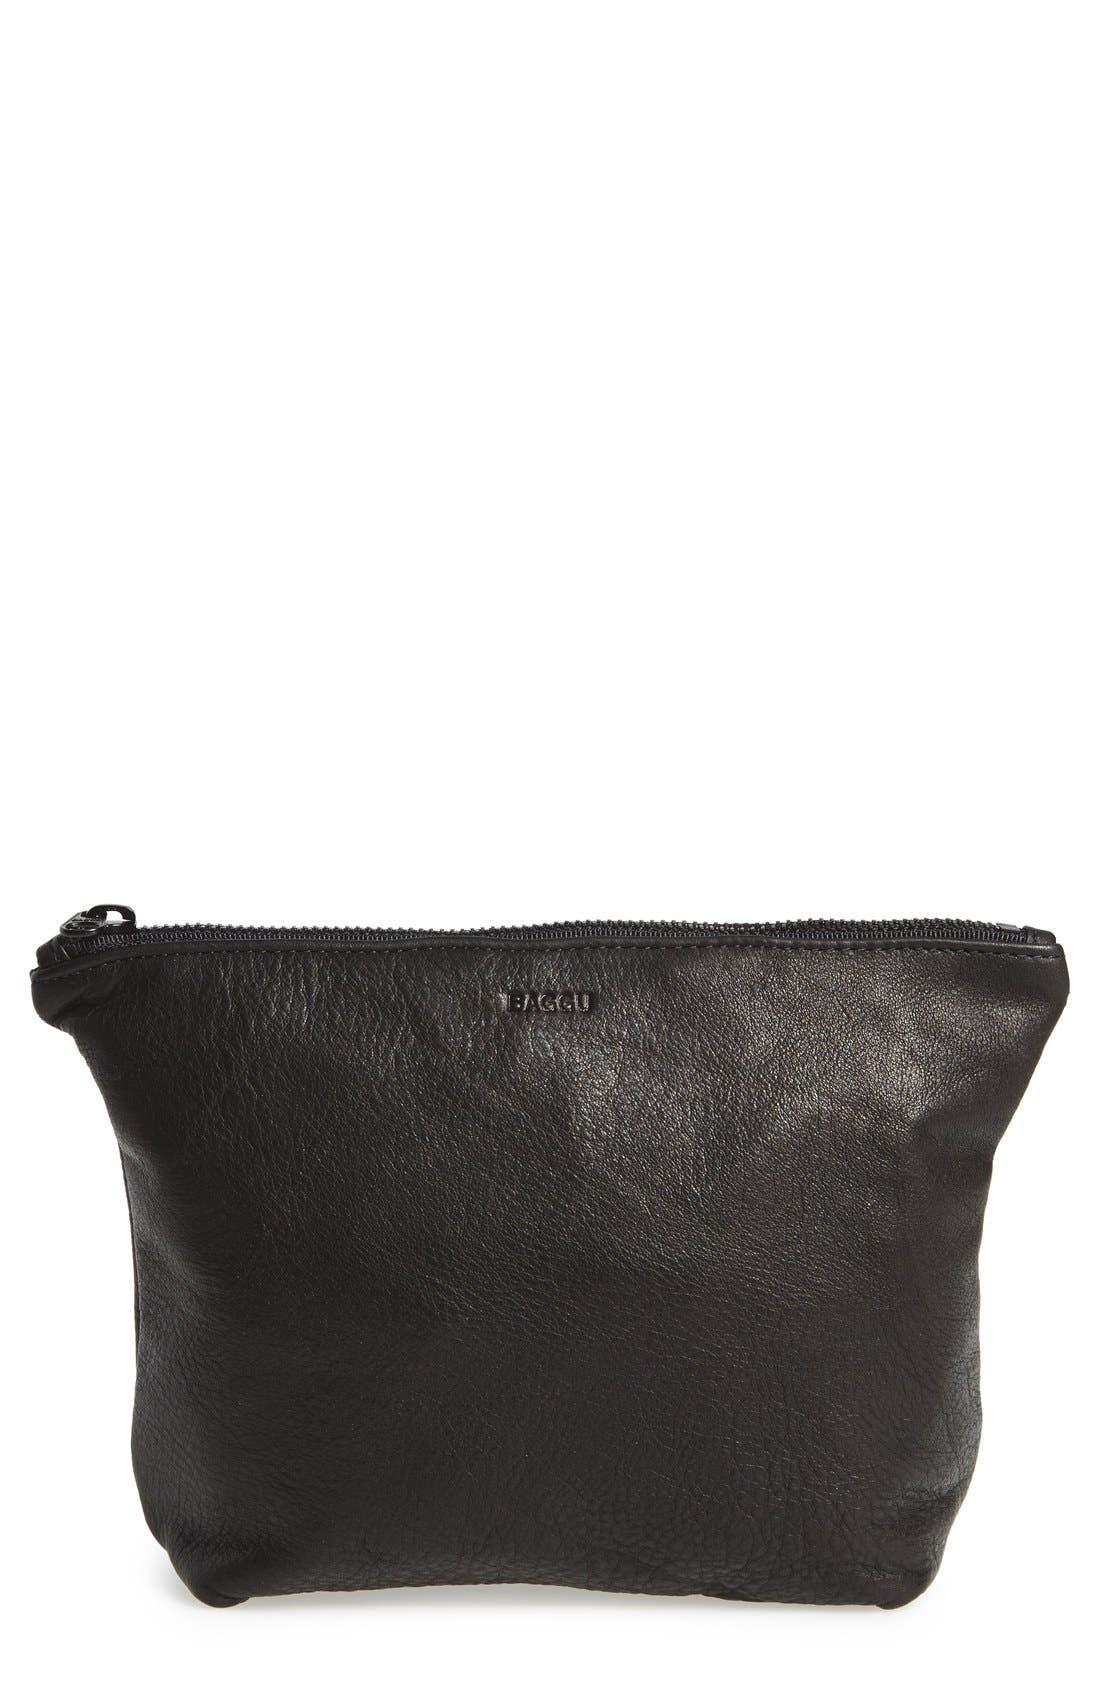 Alternate Image 1 Selected - Baggu® Medium Leather Zip Pouch